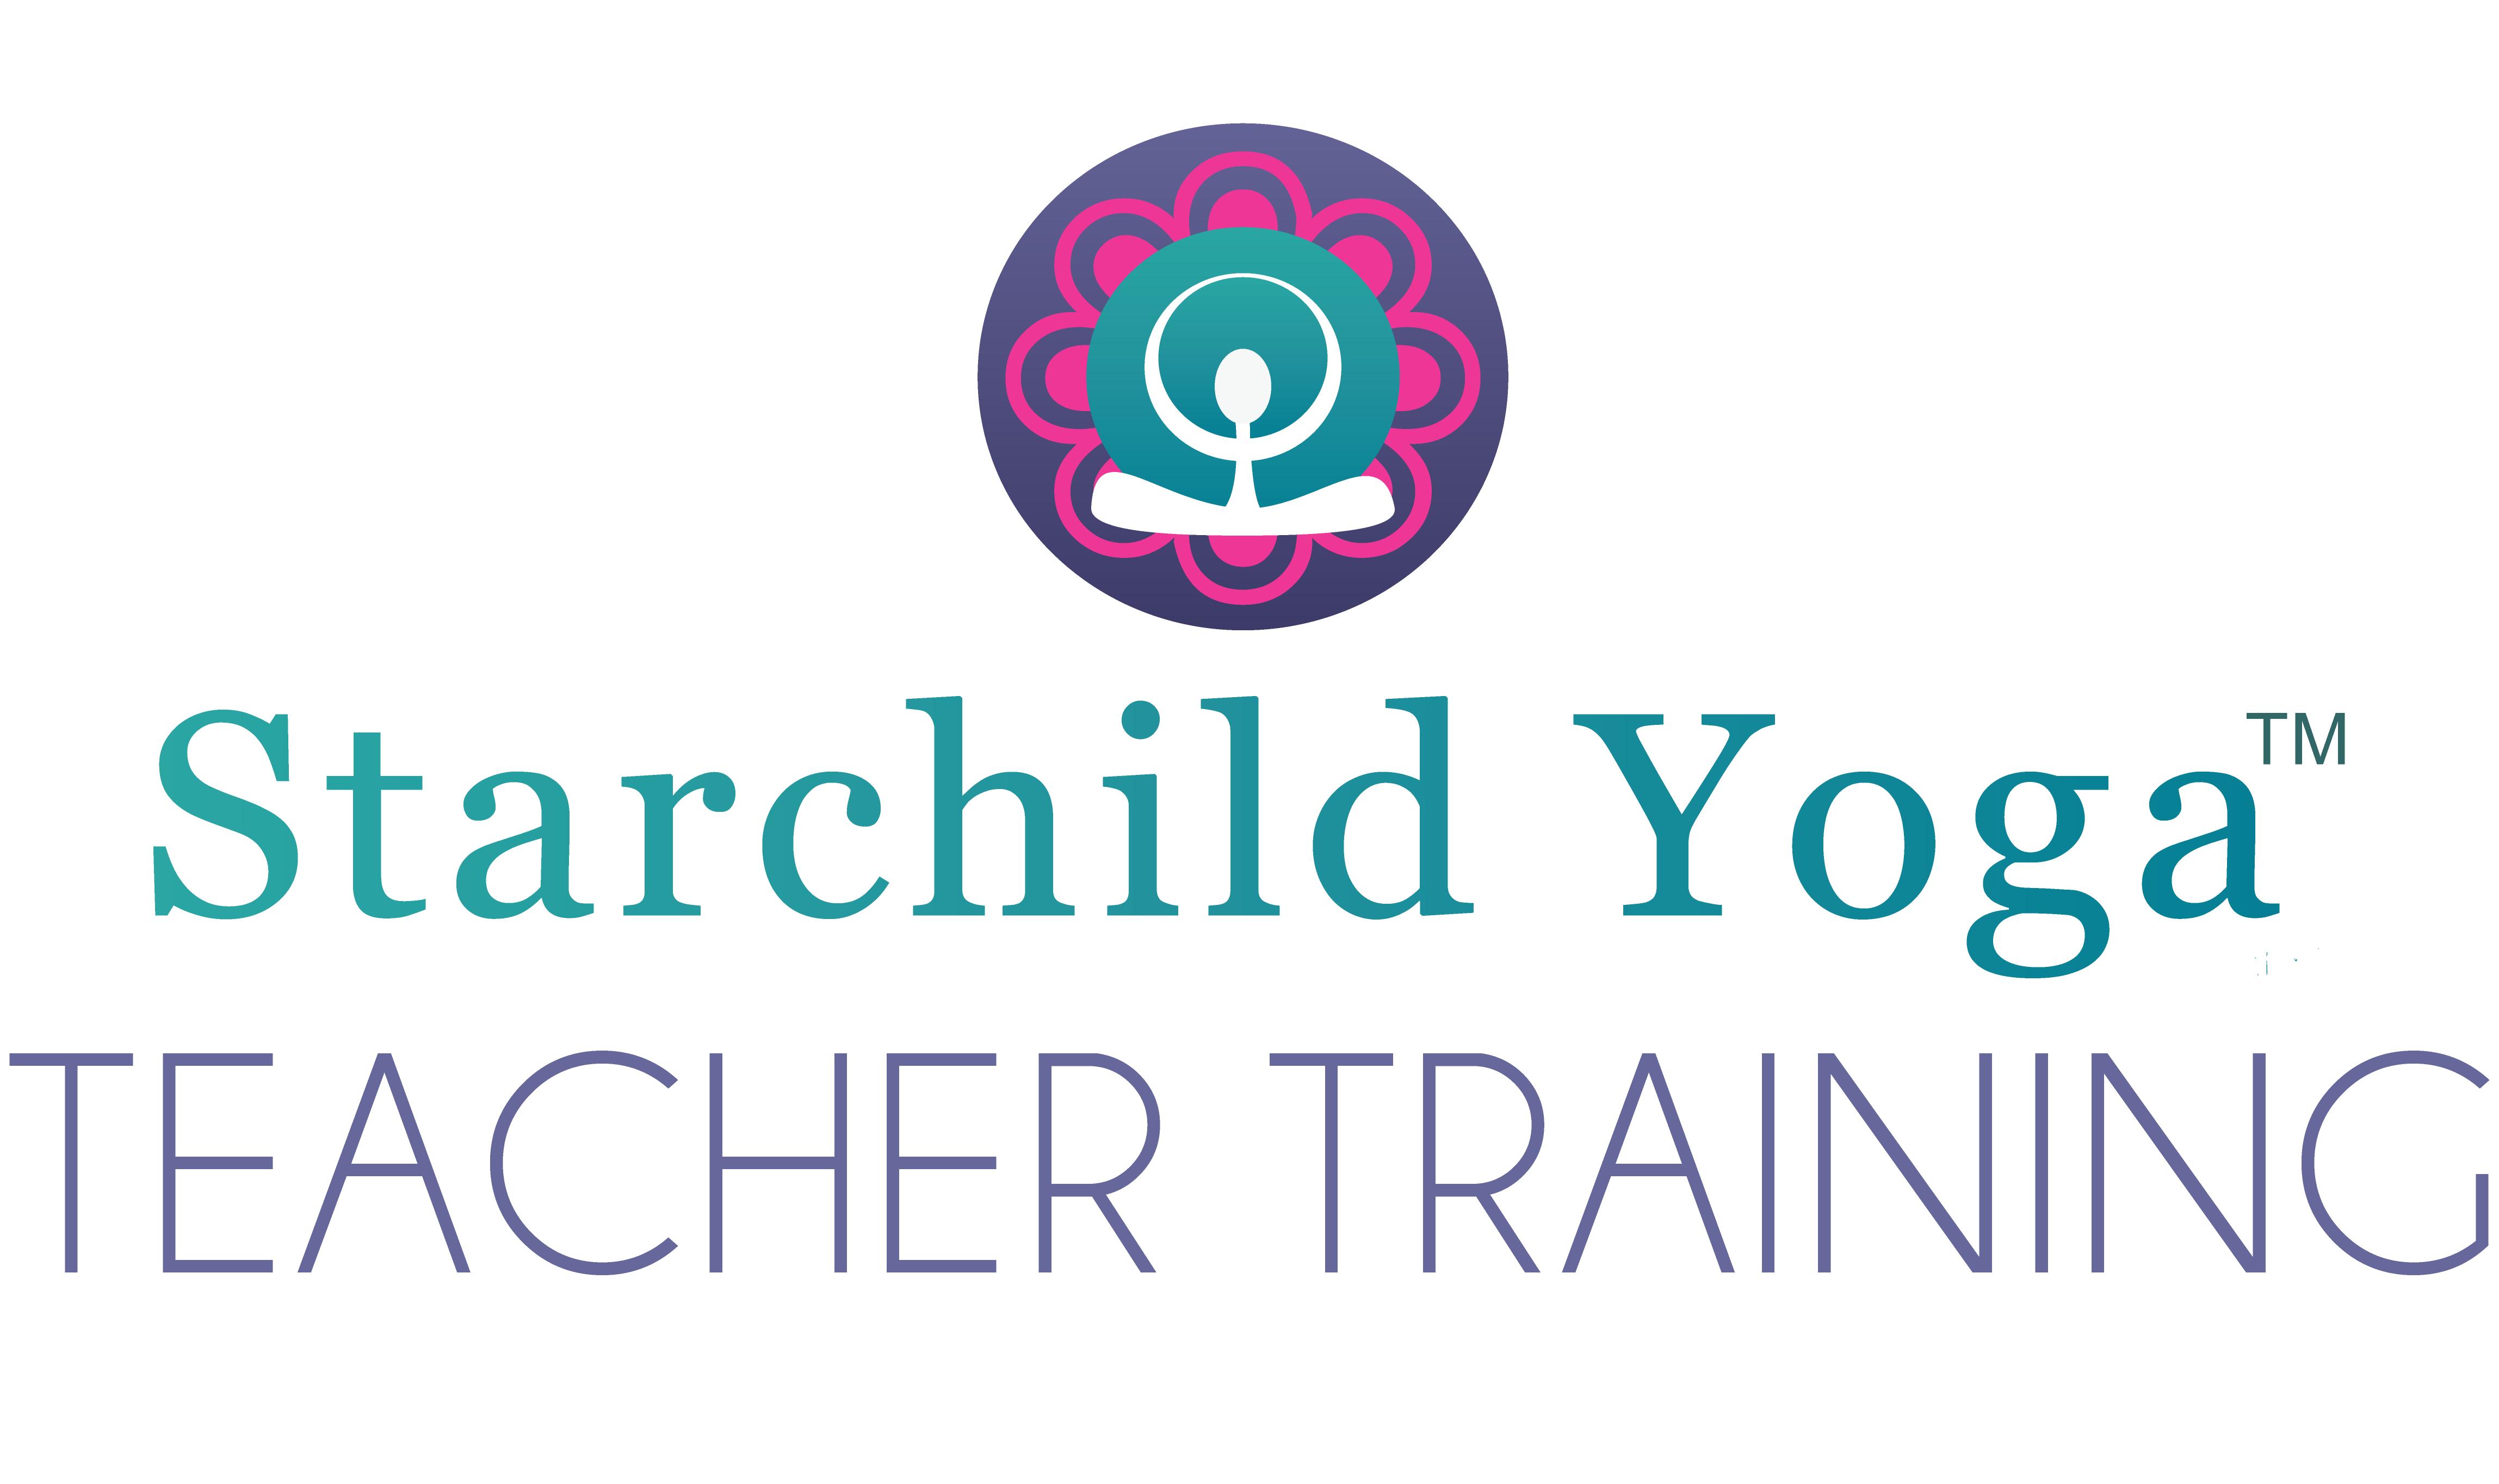 StarchildYoga TEACHER TRAINING-23